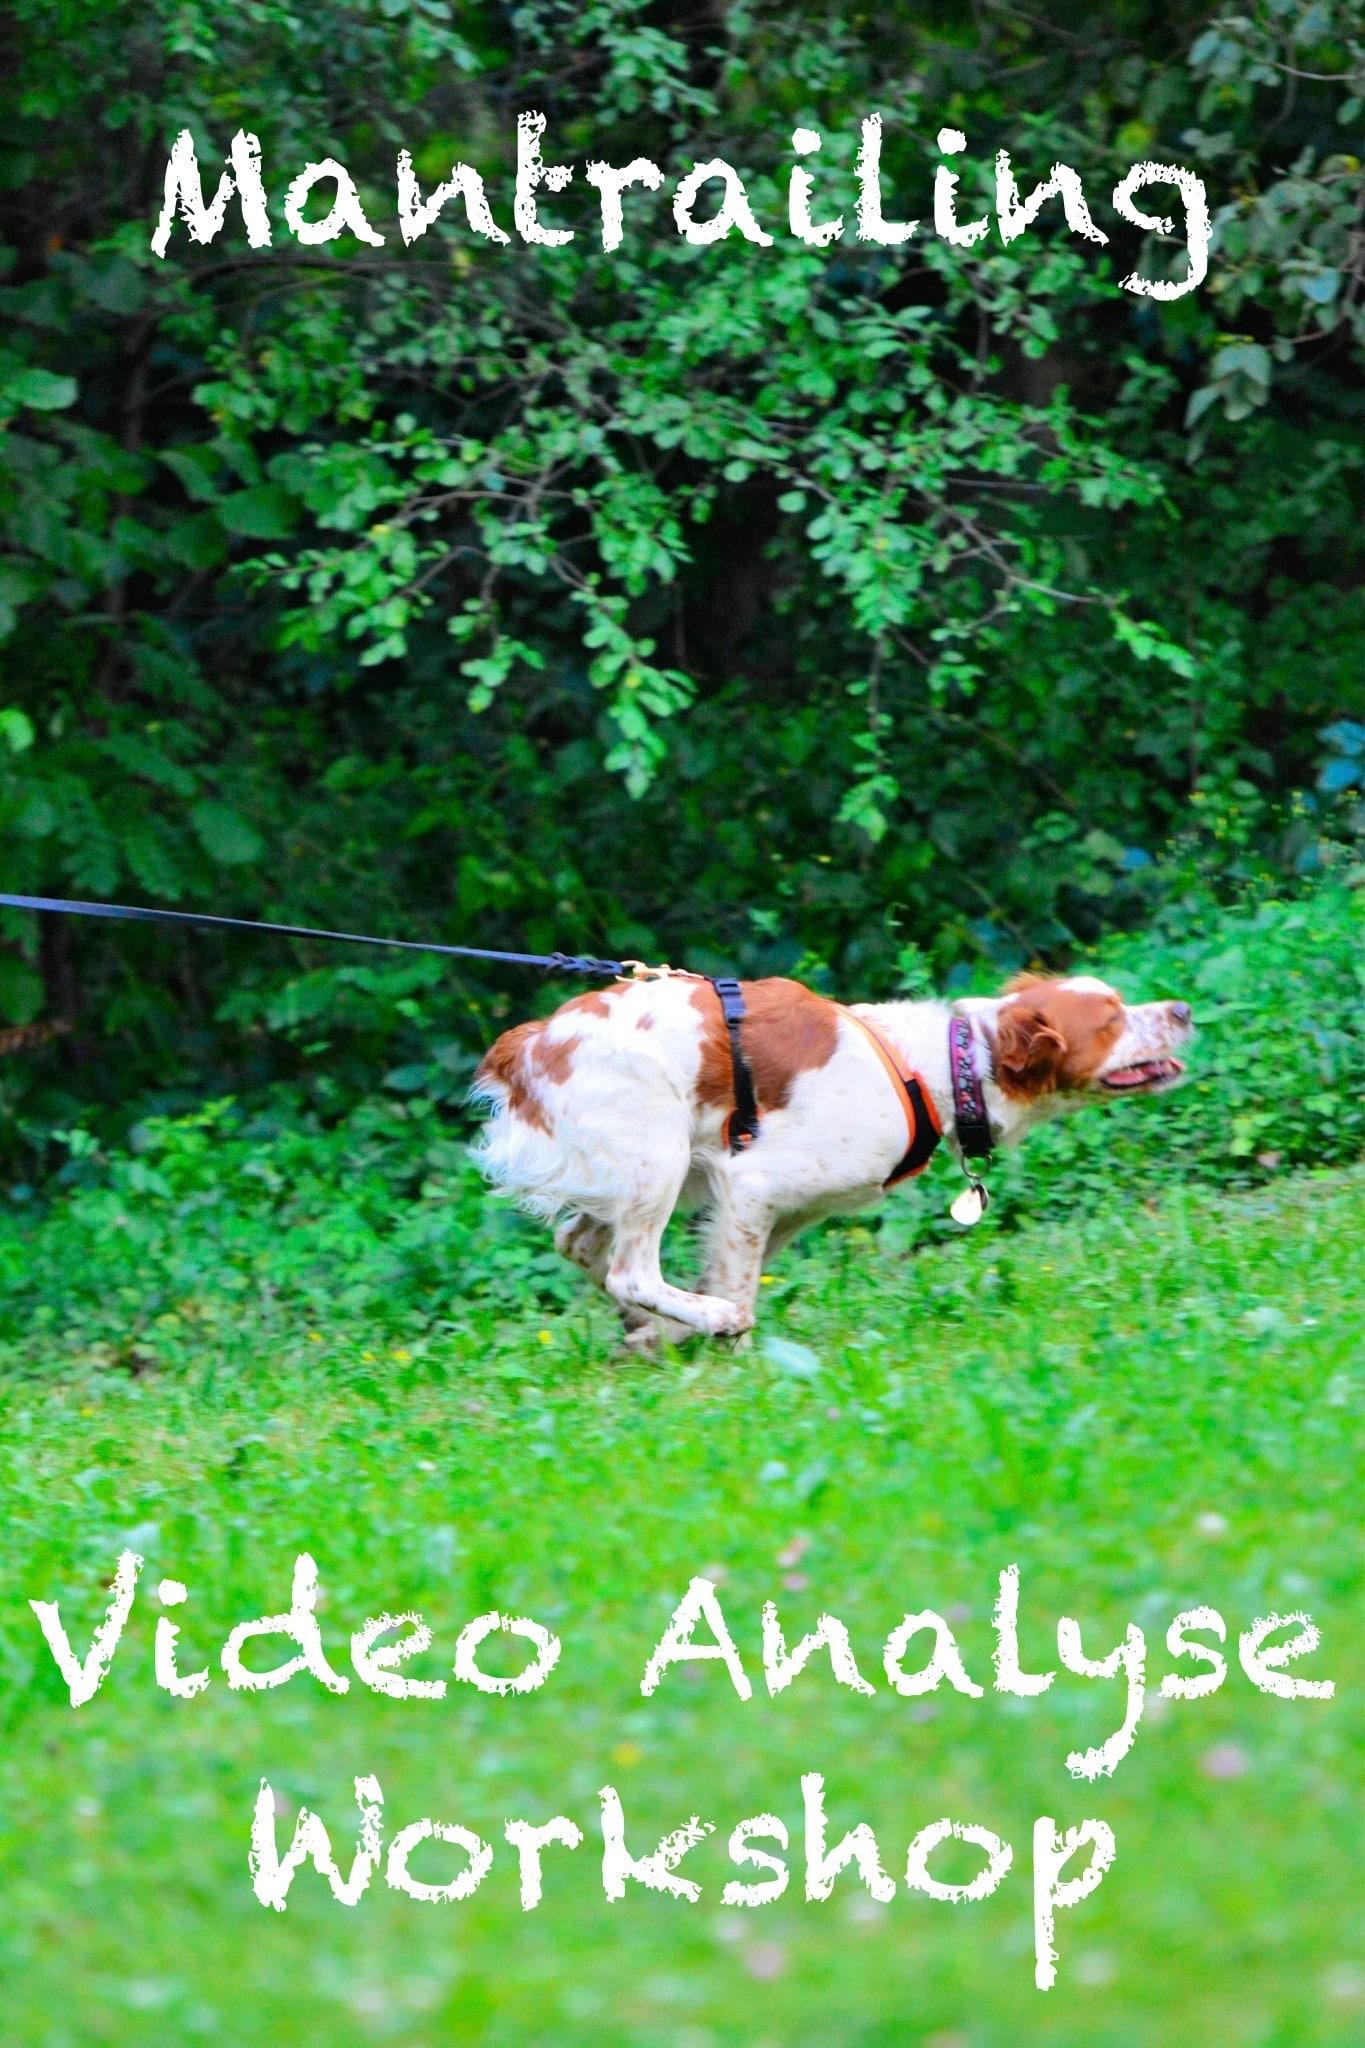 Mantrailing Videoanalyse Workshop